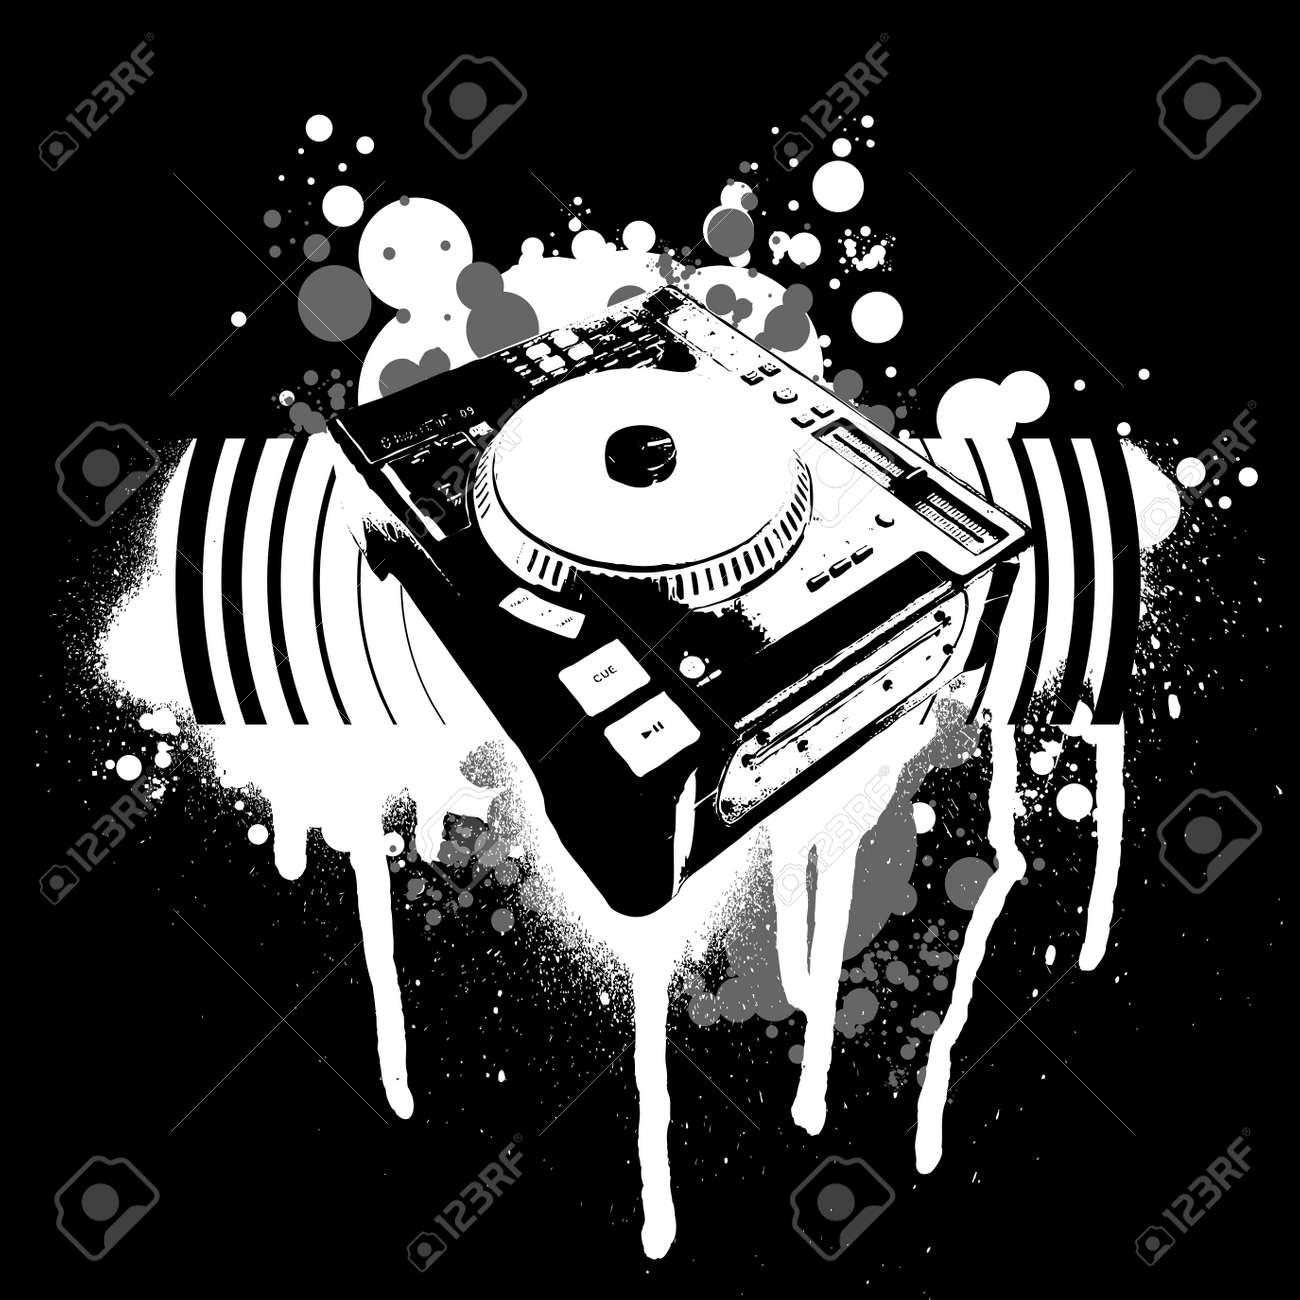 Graffiti black and white turntable stock vector 2240478